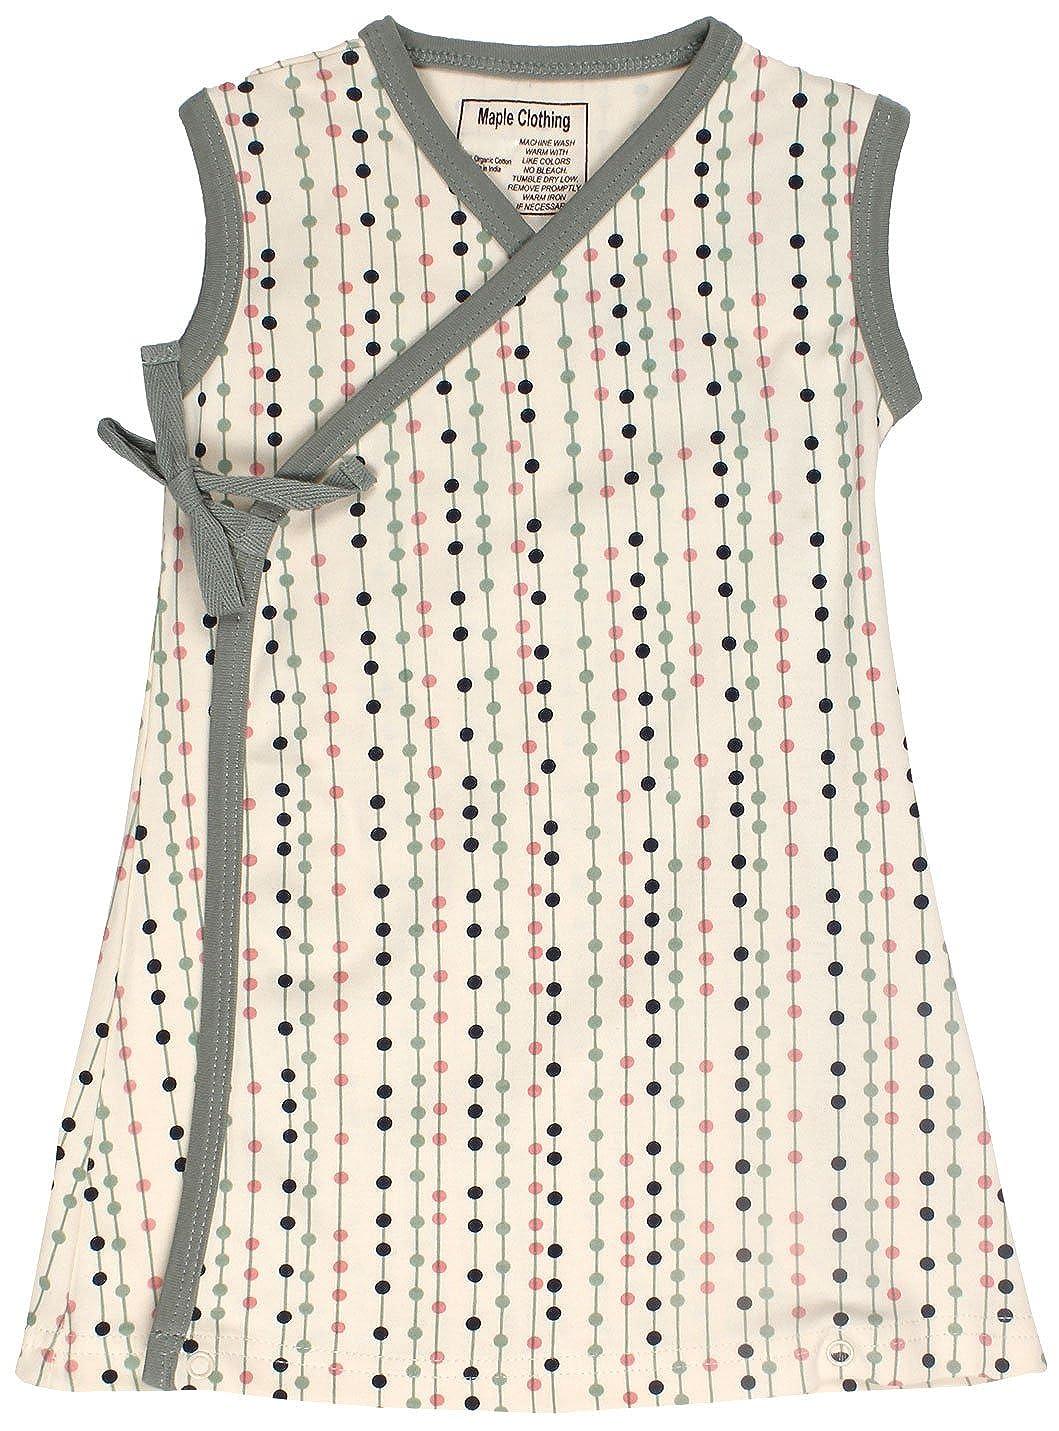 Maple Clothing DRESS ベビーガールズ 6 - 12 Months Natural-Stripe-Dots B00Y1DCTTM